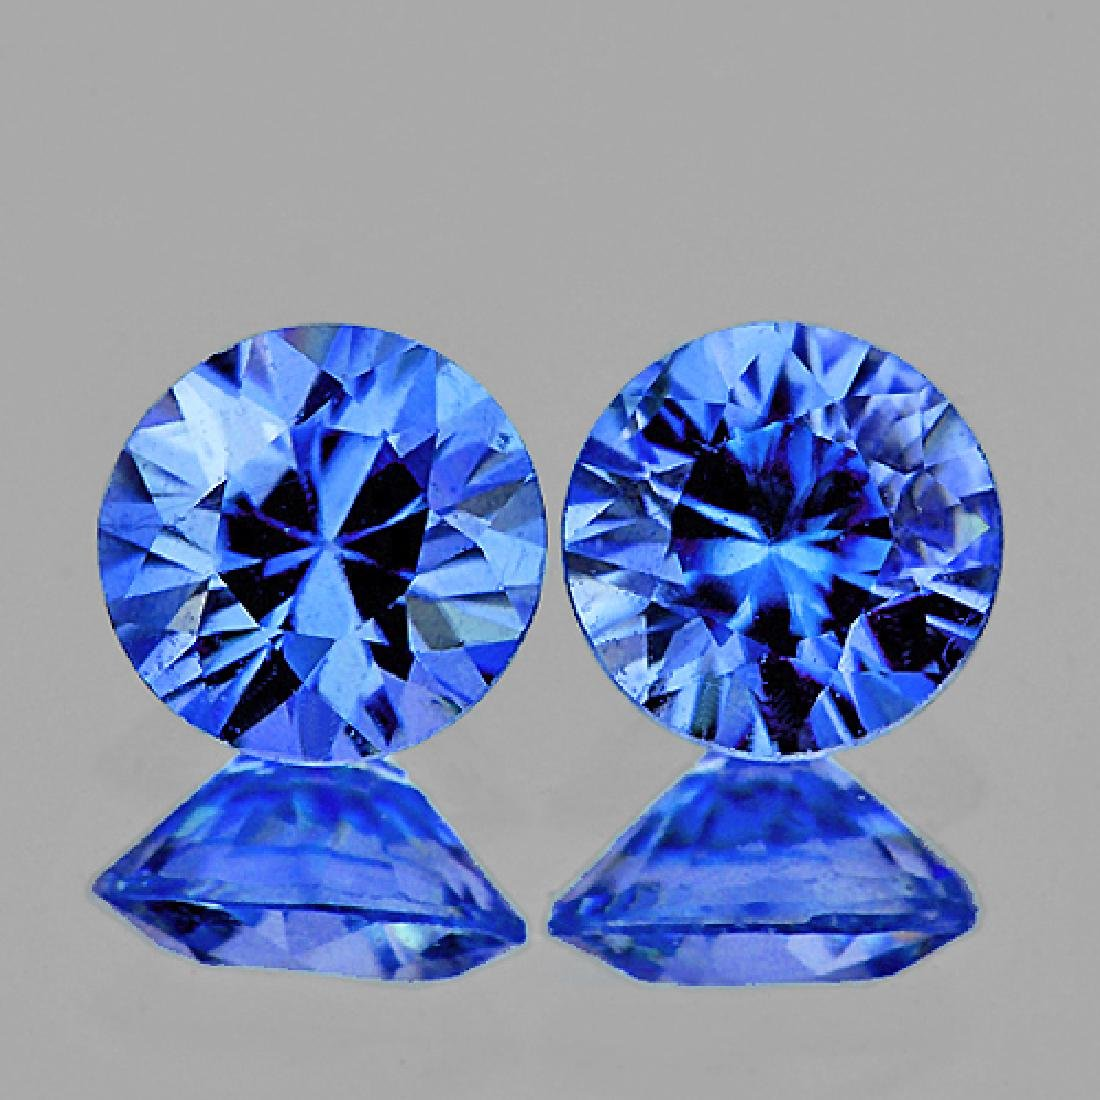 Natural Kashmir Sapphire Pair 3.70 MM